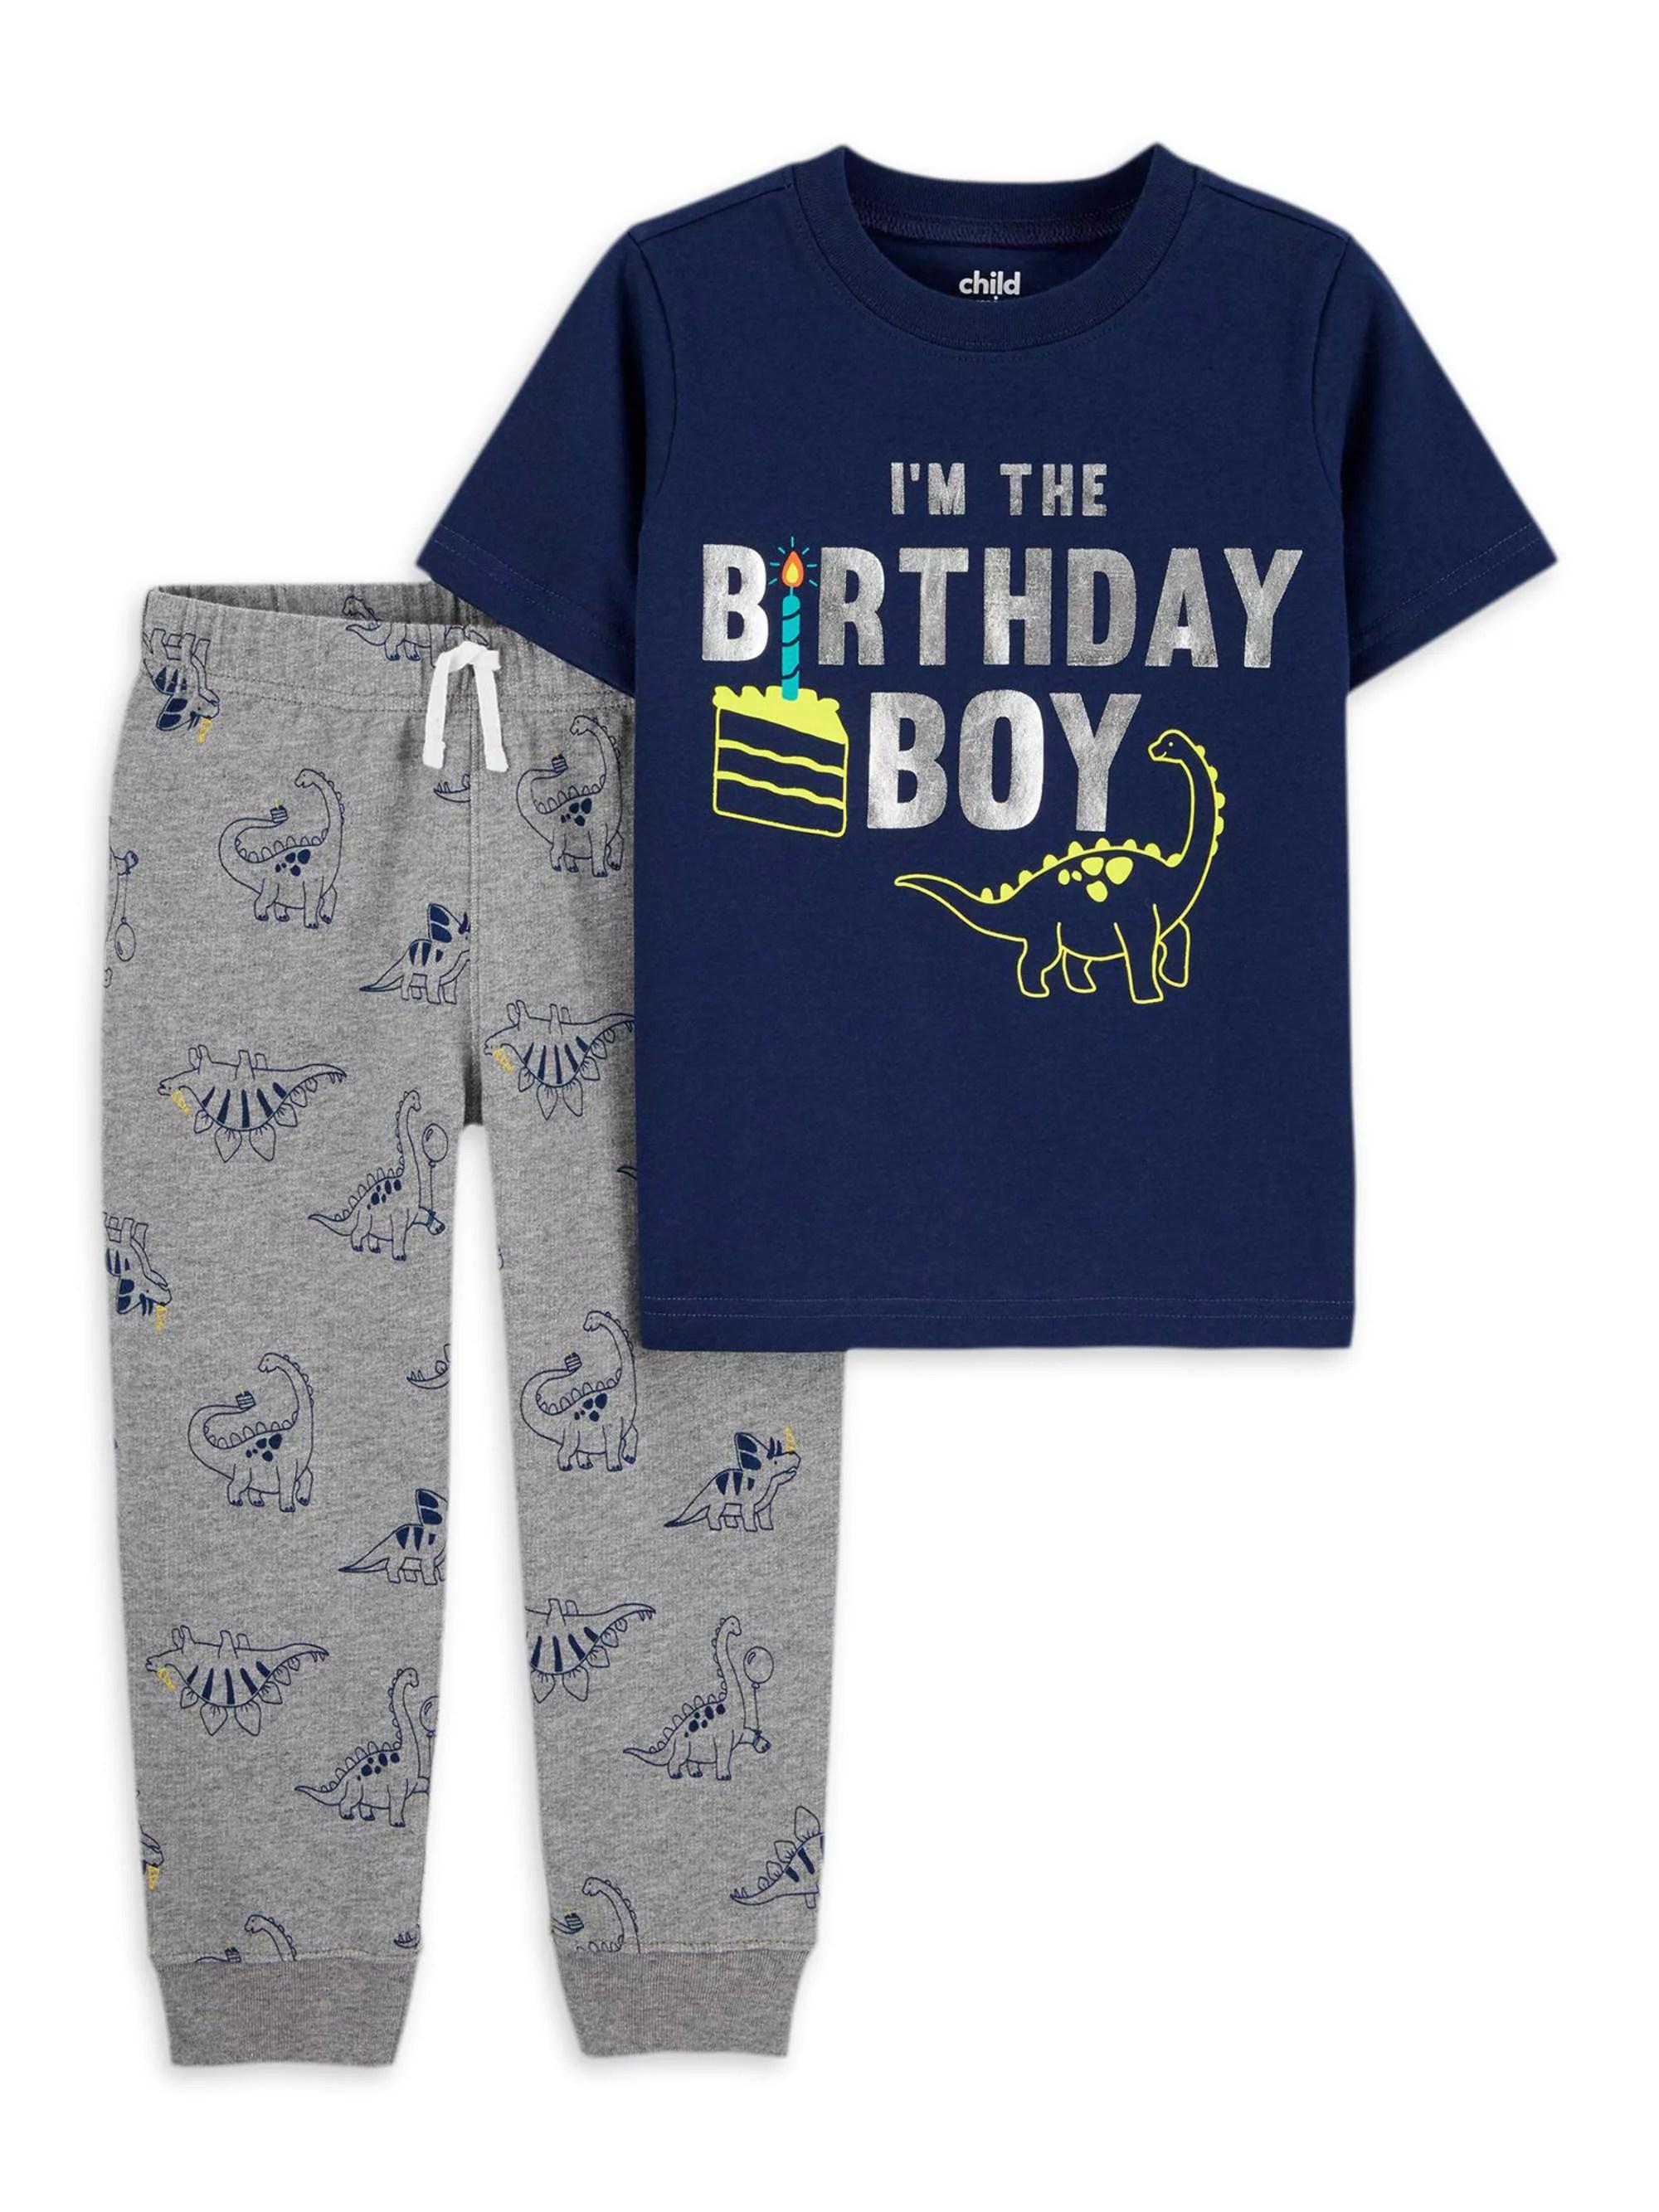 Child Of Mine By Carter S Child Of Mine By Carter S Baby Boy Toddler Boy Birthday Short Sleeve T Shirt Pants Outfit Set 2 Piece 12m 4t Walmart Com Walmart Com